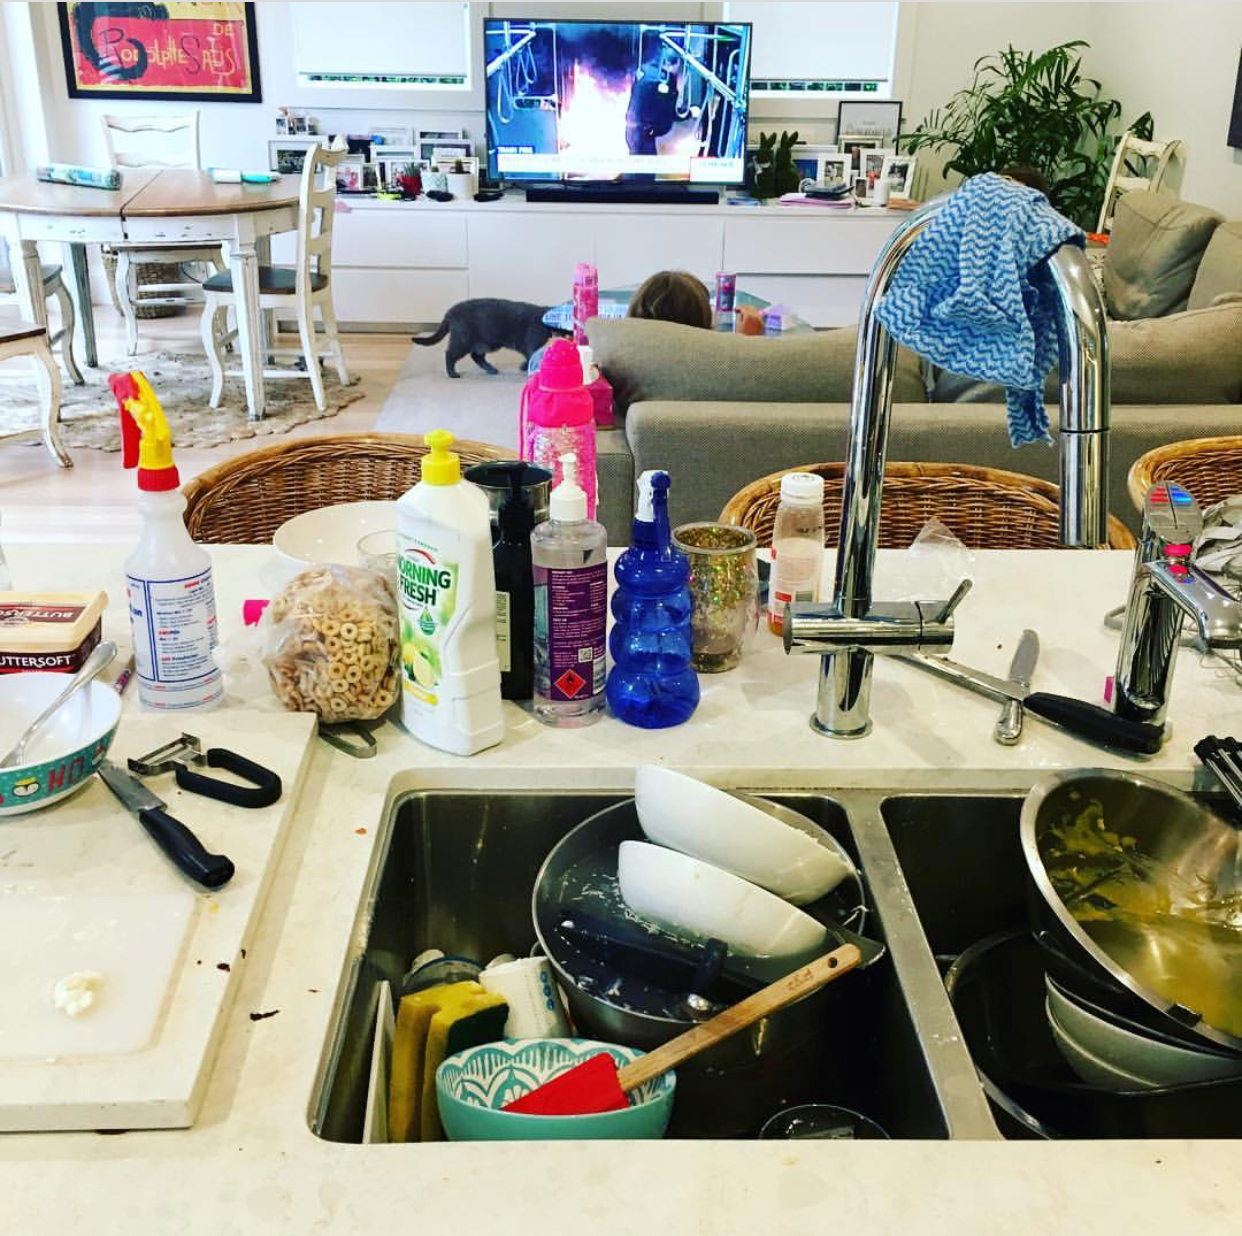 My sink always looks like this...